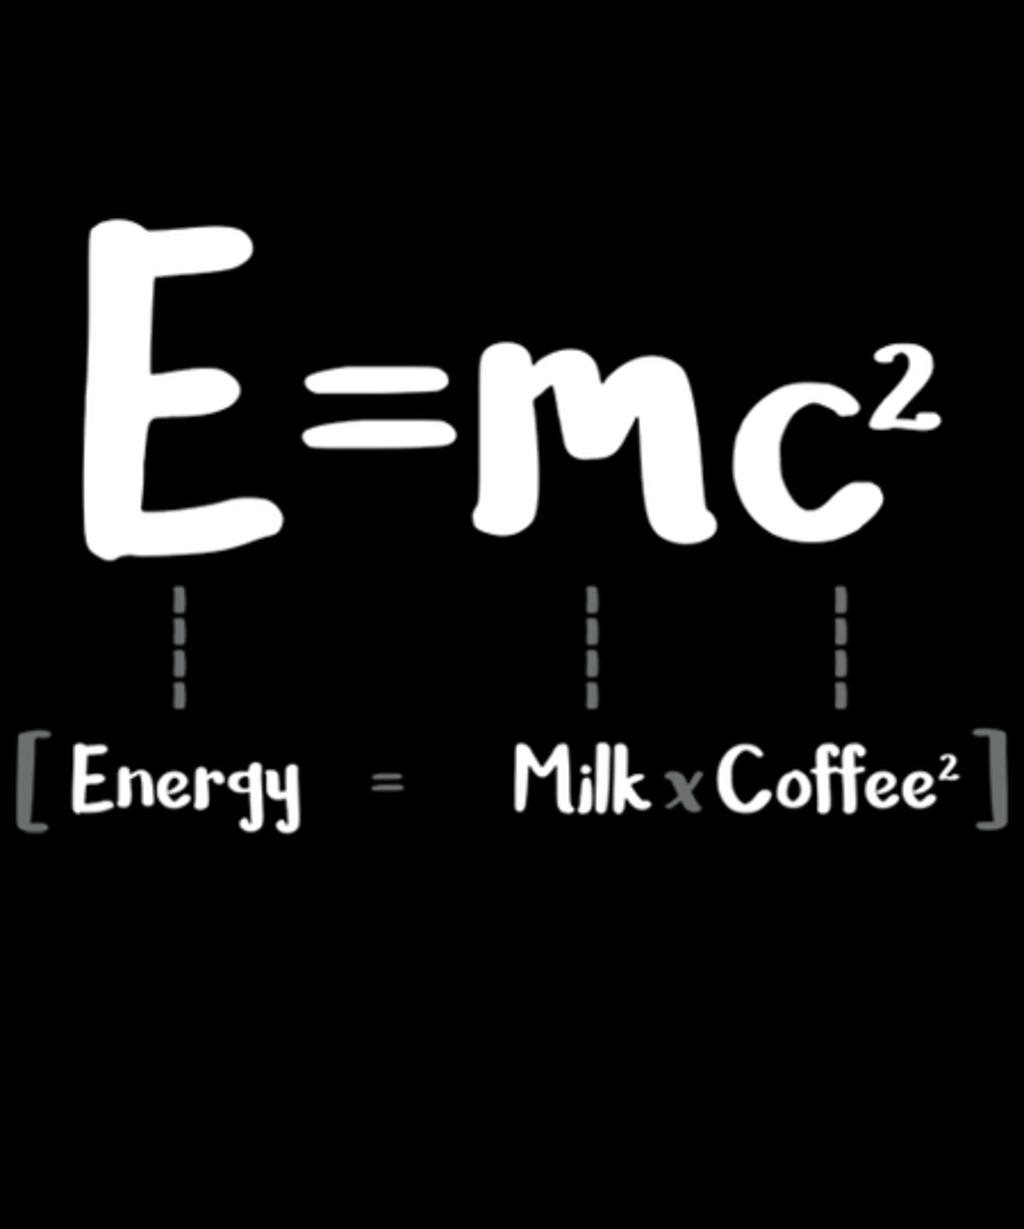 Qwertee: Milk x Coffee